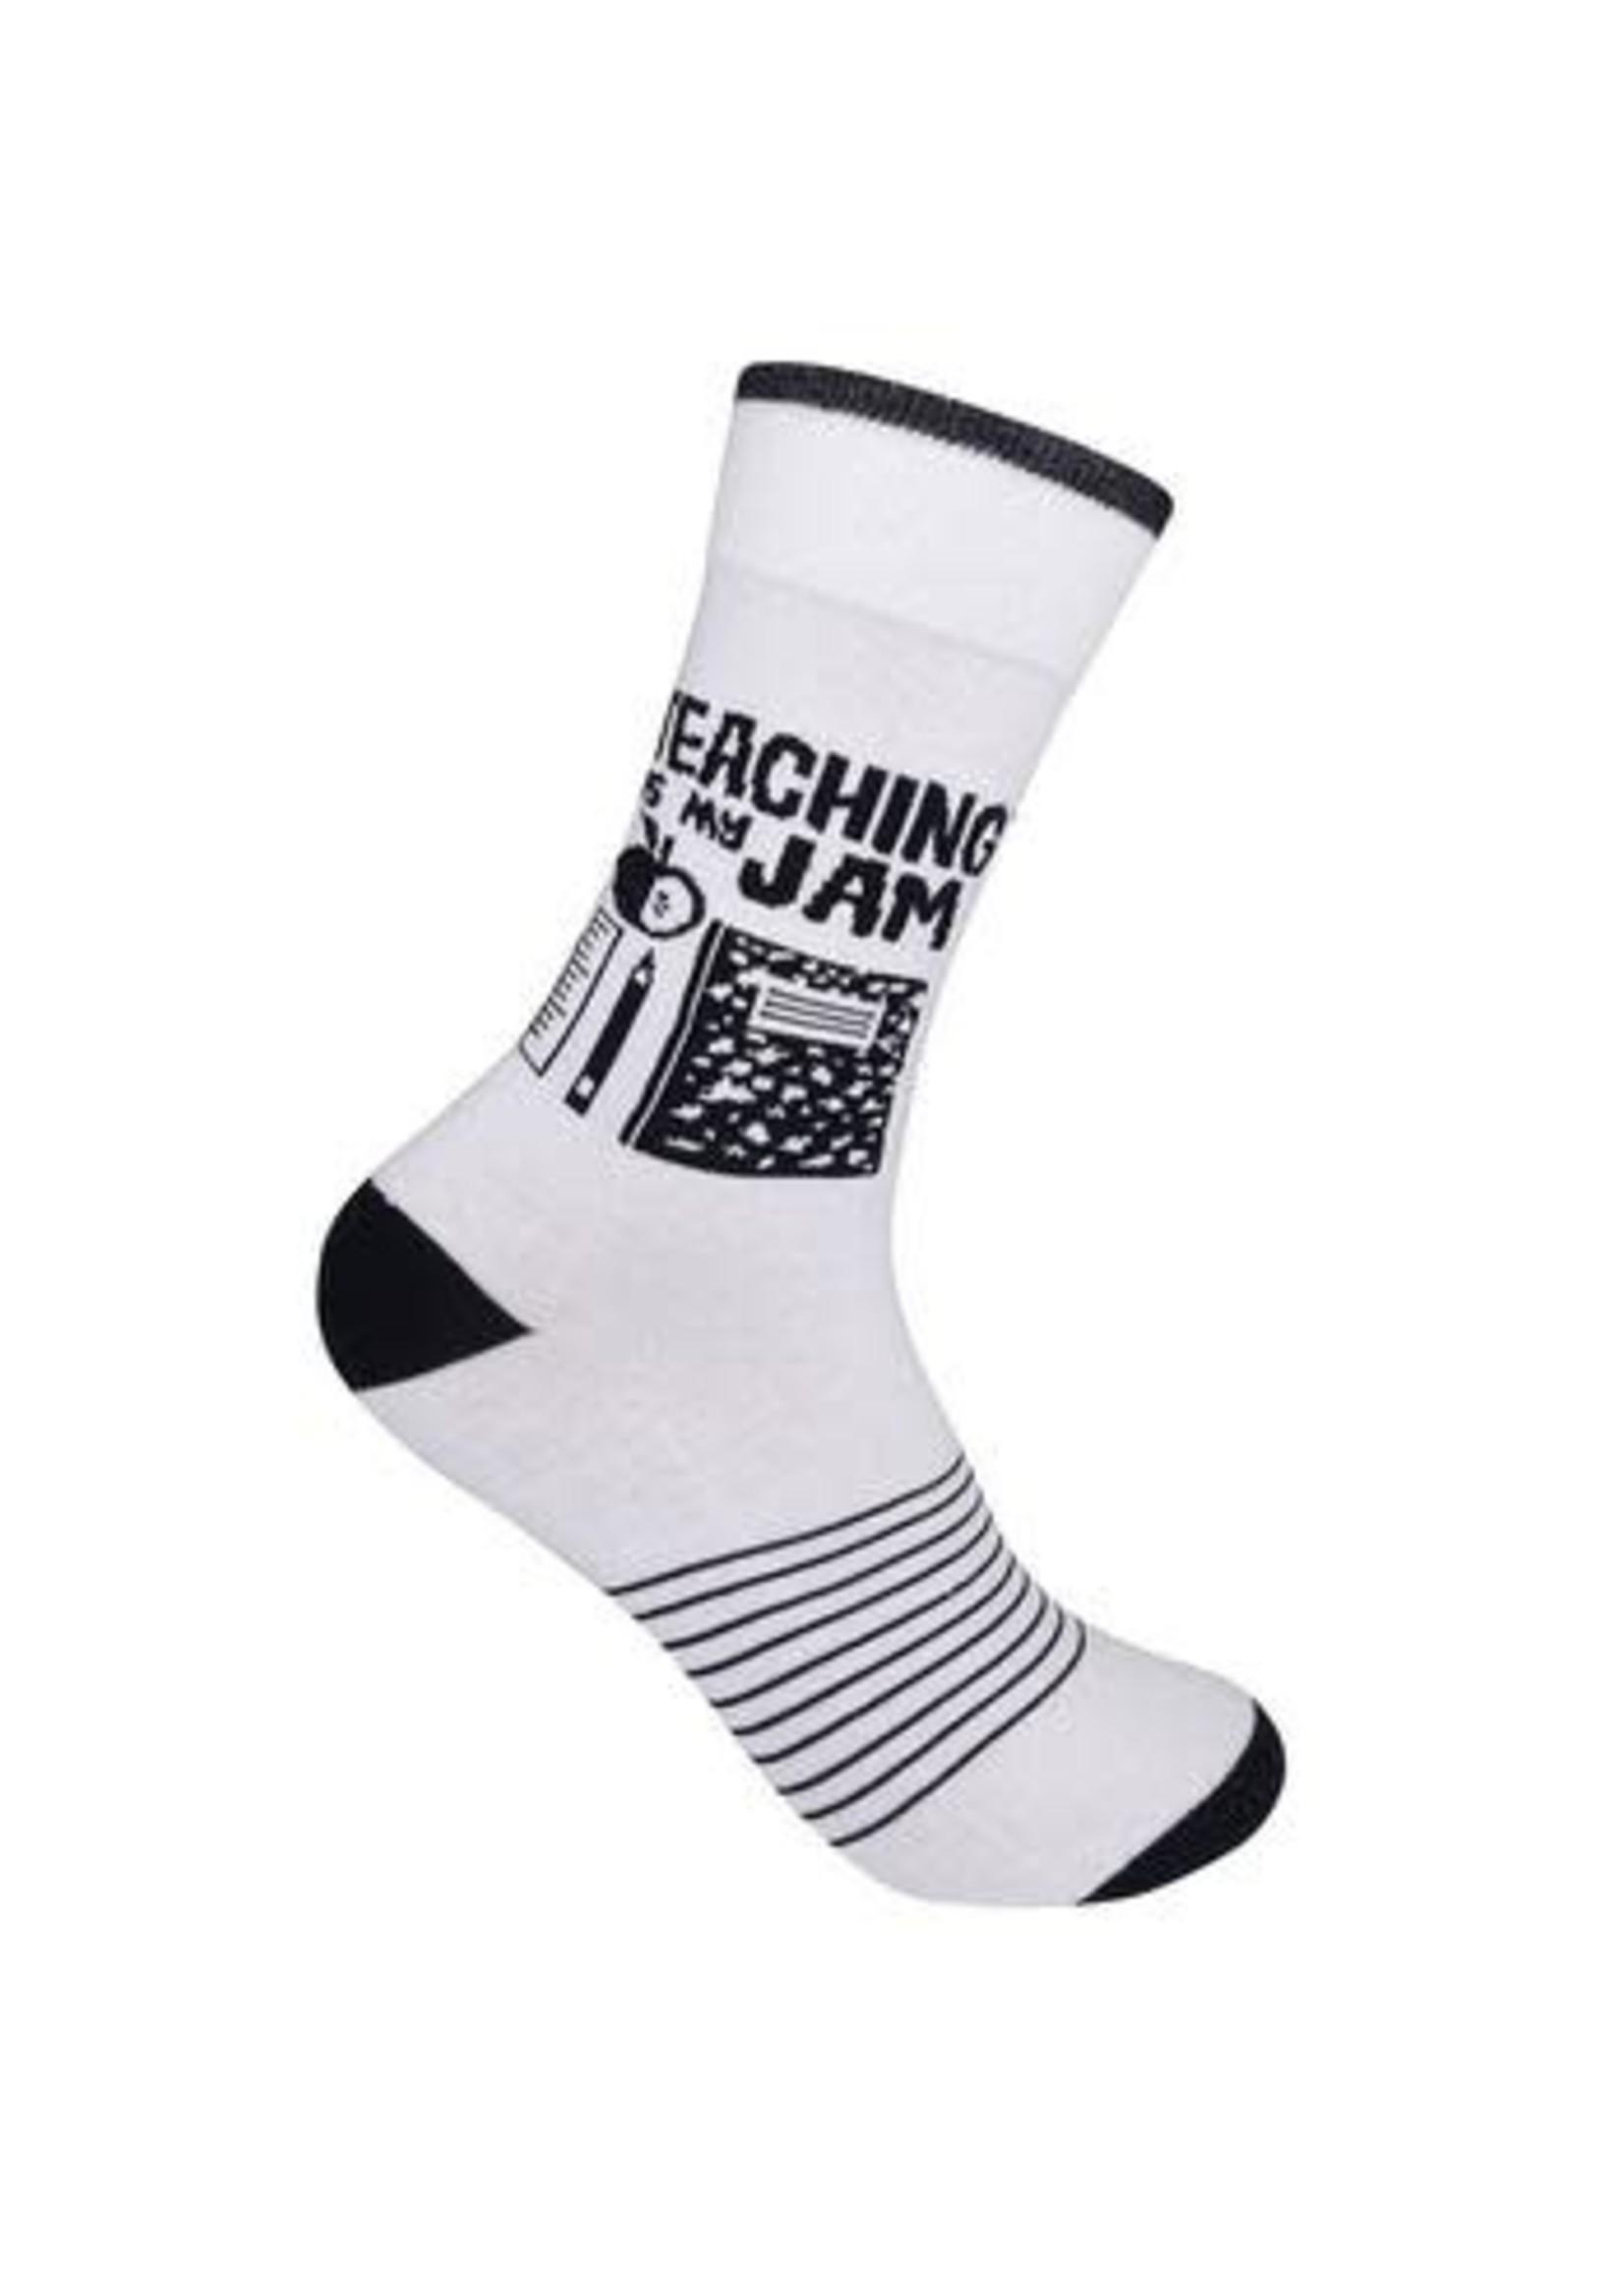 Funatic Teaching is My Jam Socks